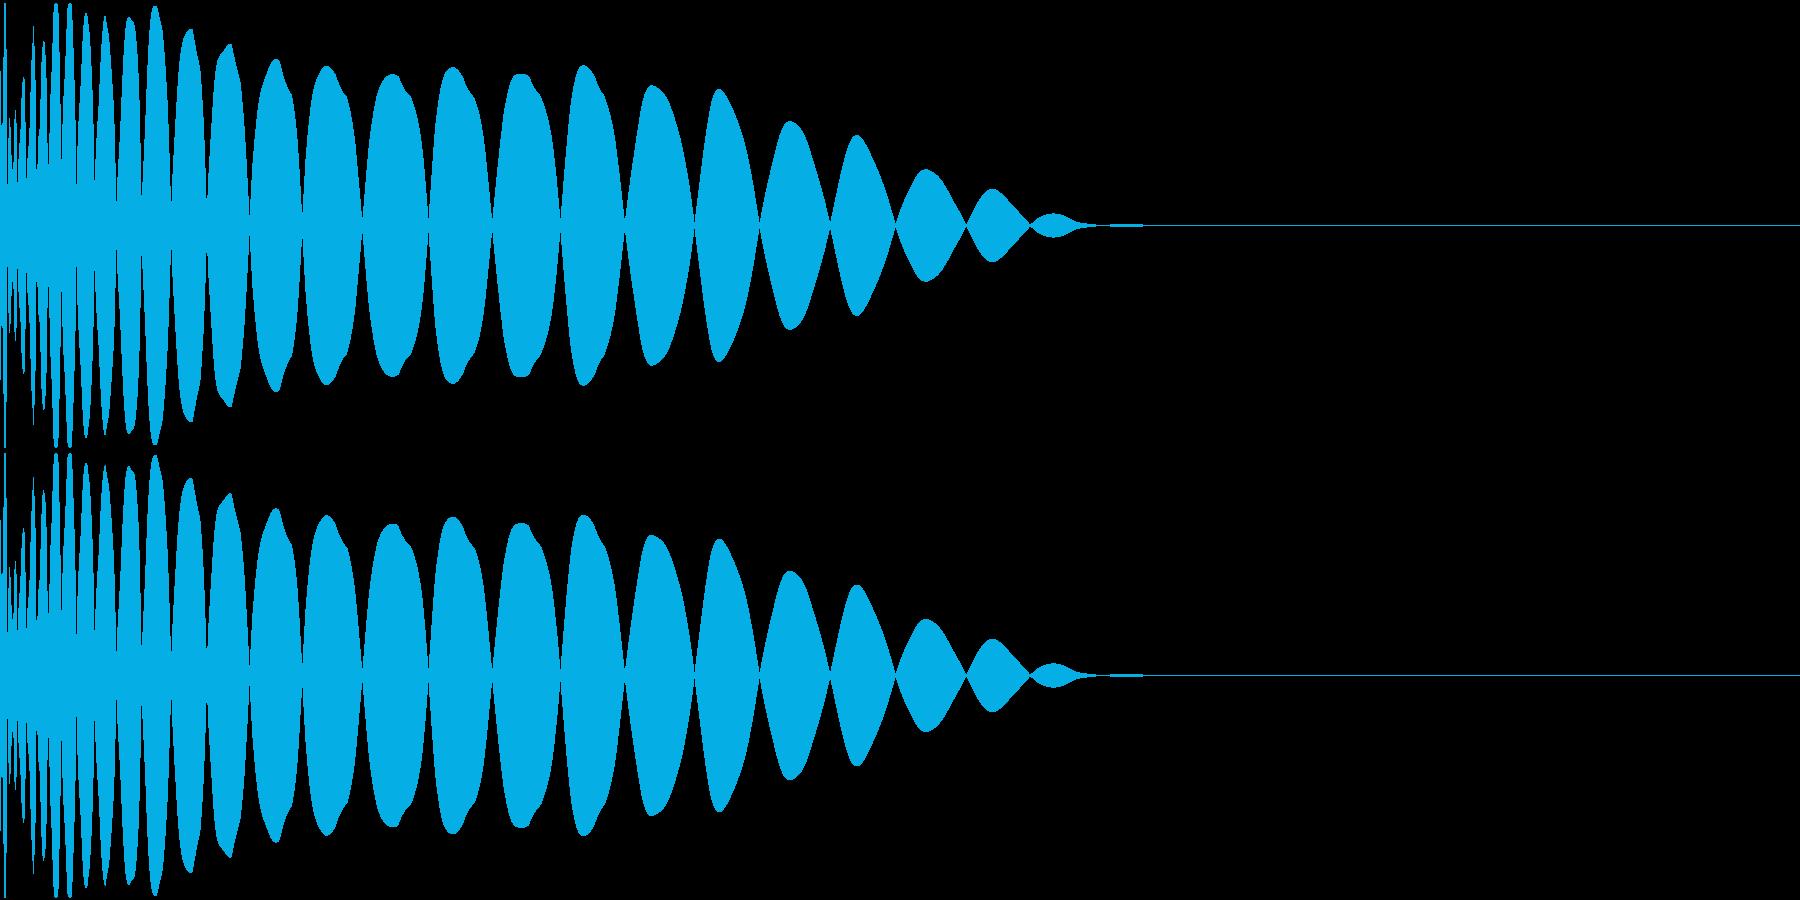 DTM Kick 53 オリジナル音源の再生済みの波形